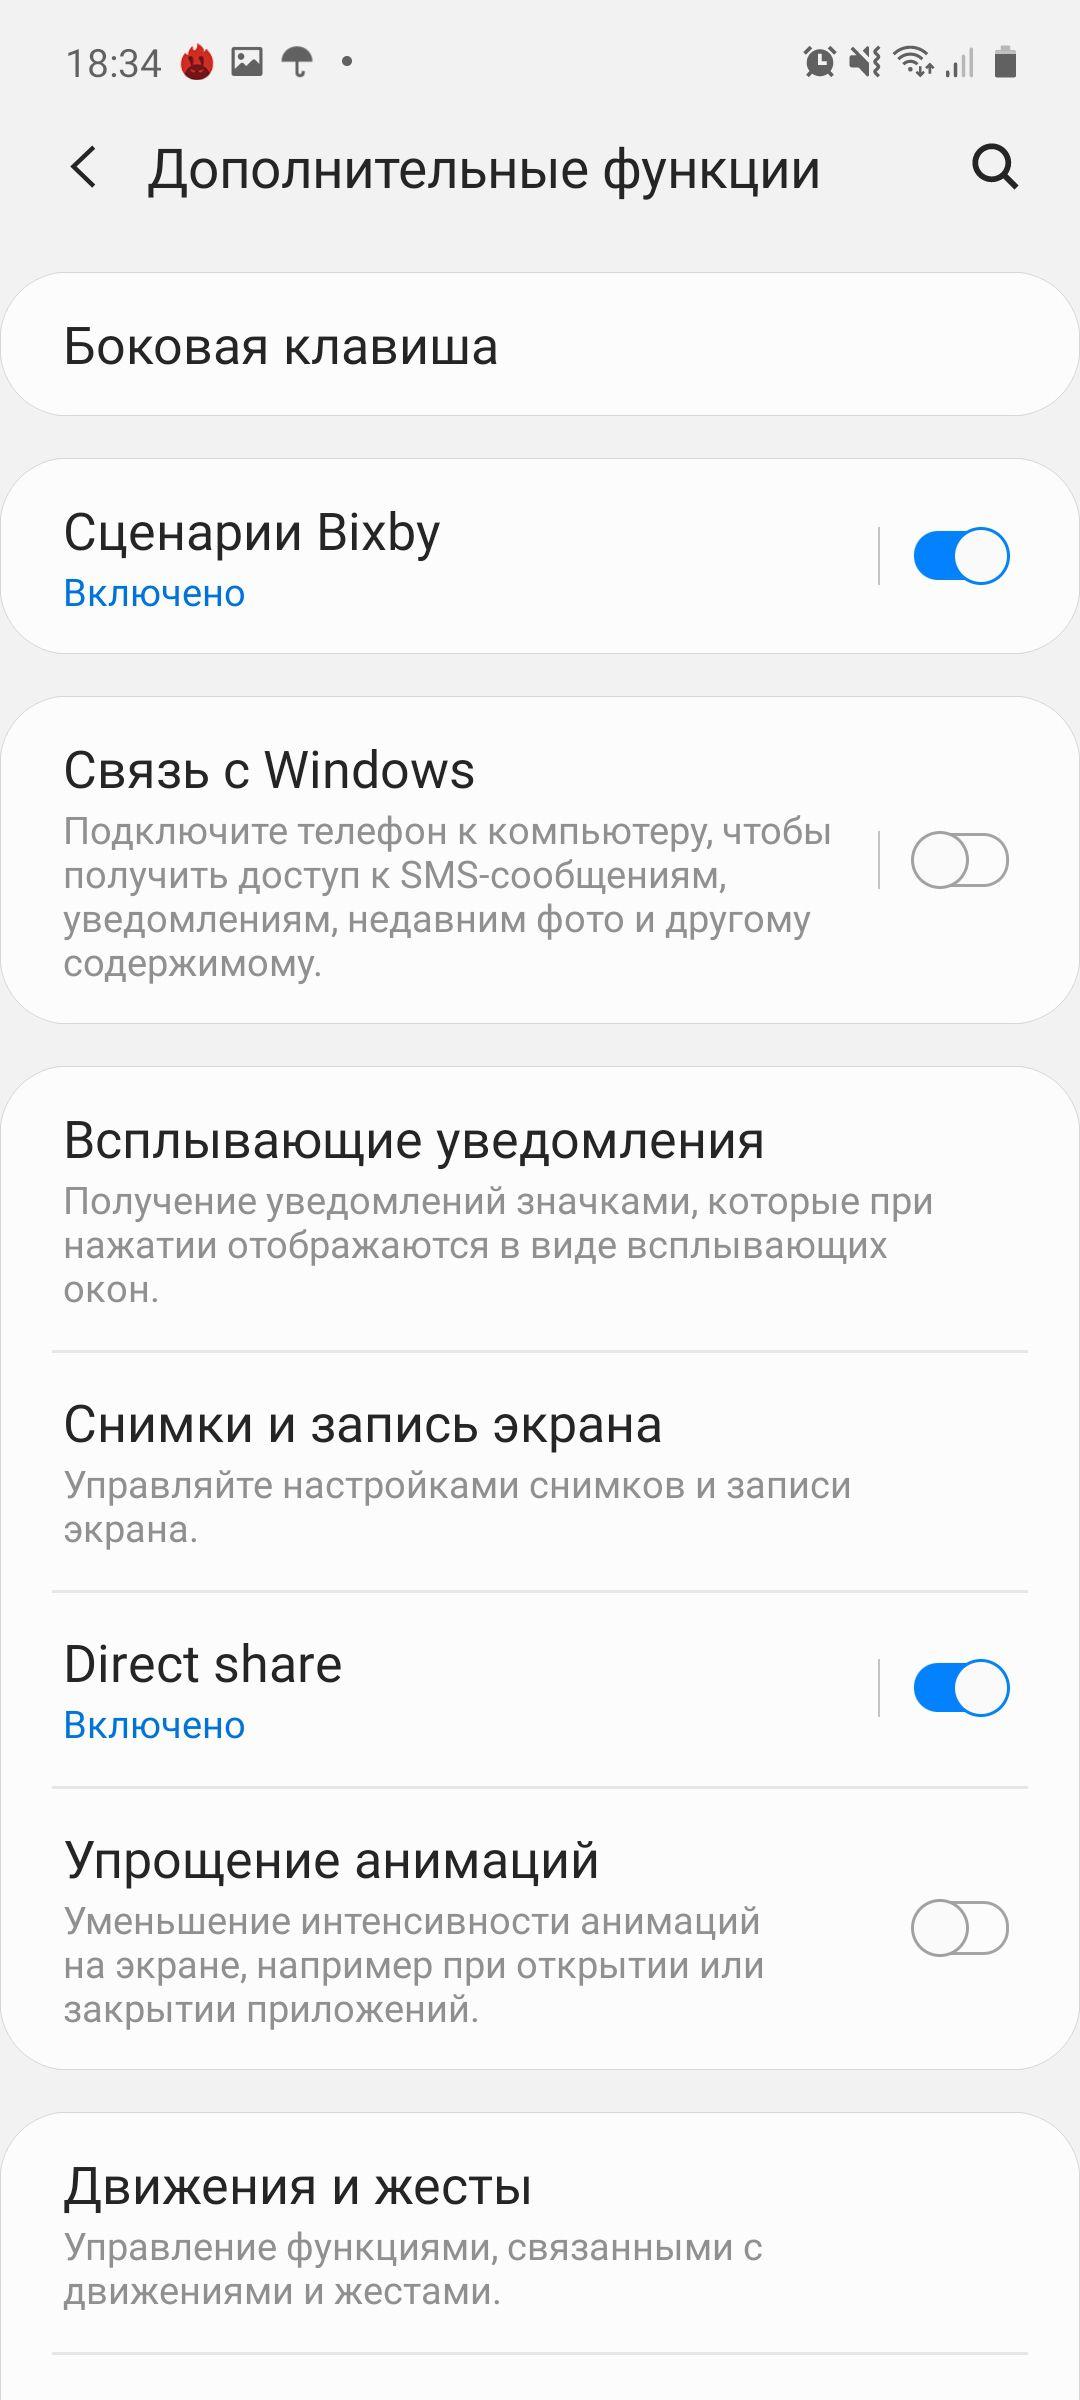 Обзор Samsung Galaxy A71: завышенный середнячок Samsung  - obzor_samsung_galaxy_a71_overprajsnutyj_serednak_picture26_27